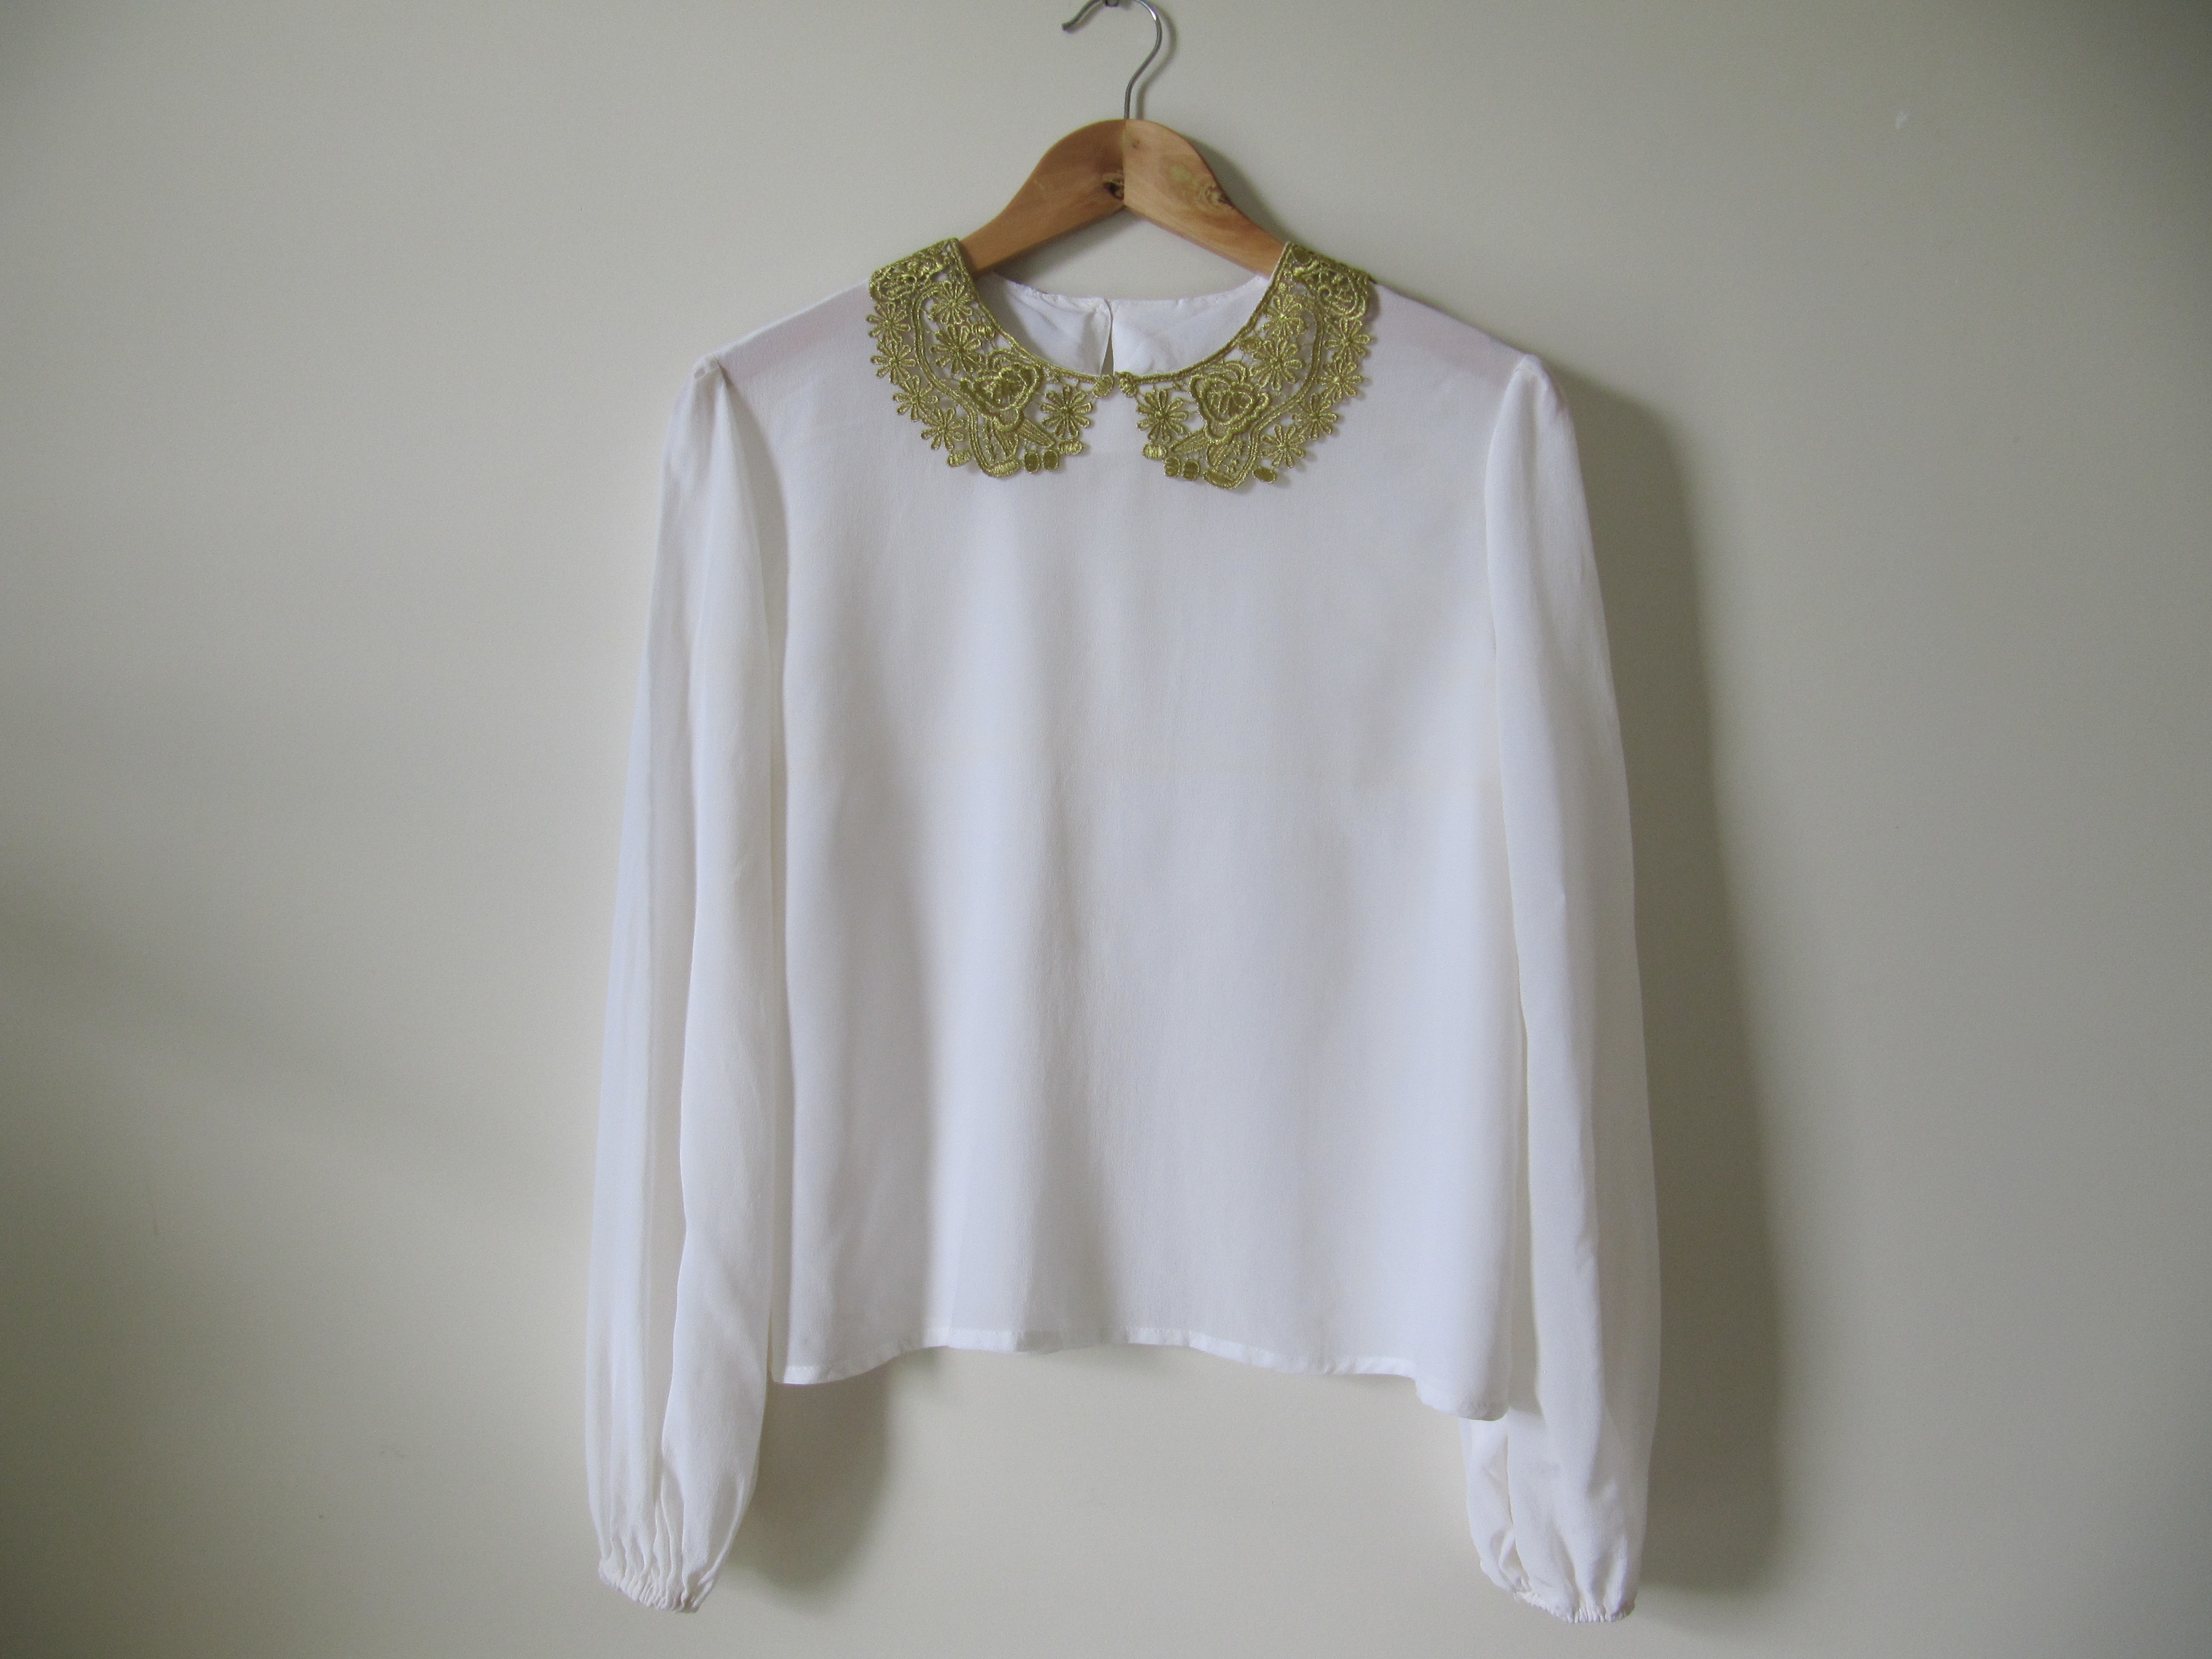 Free peter pan collar blouse pattern peach chevron blouse for Peter pan shirt pattern